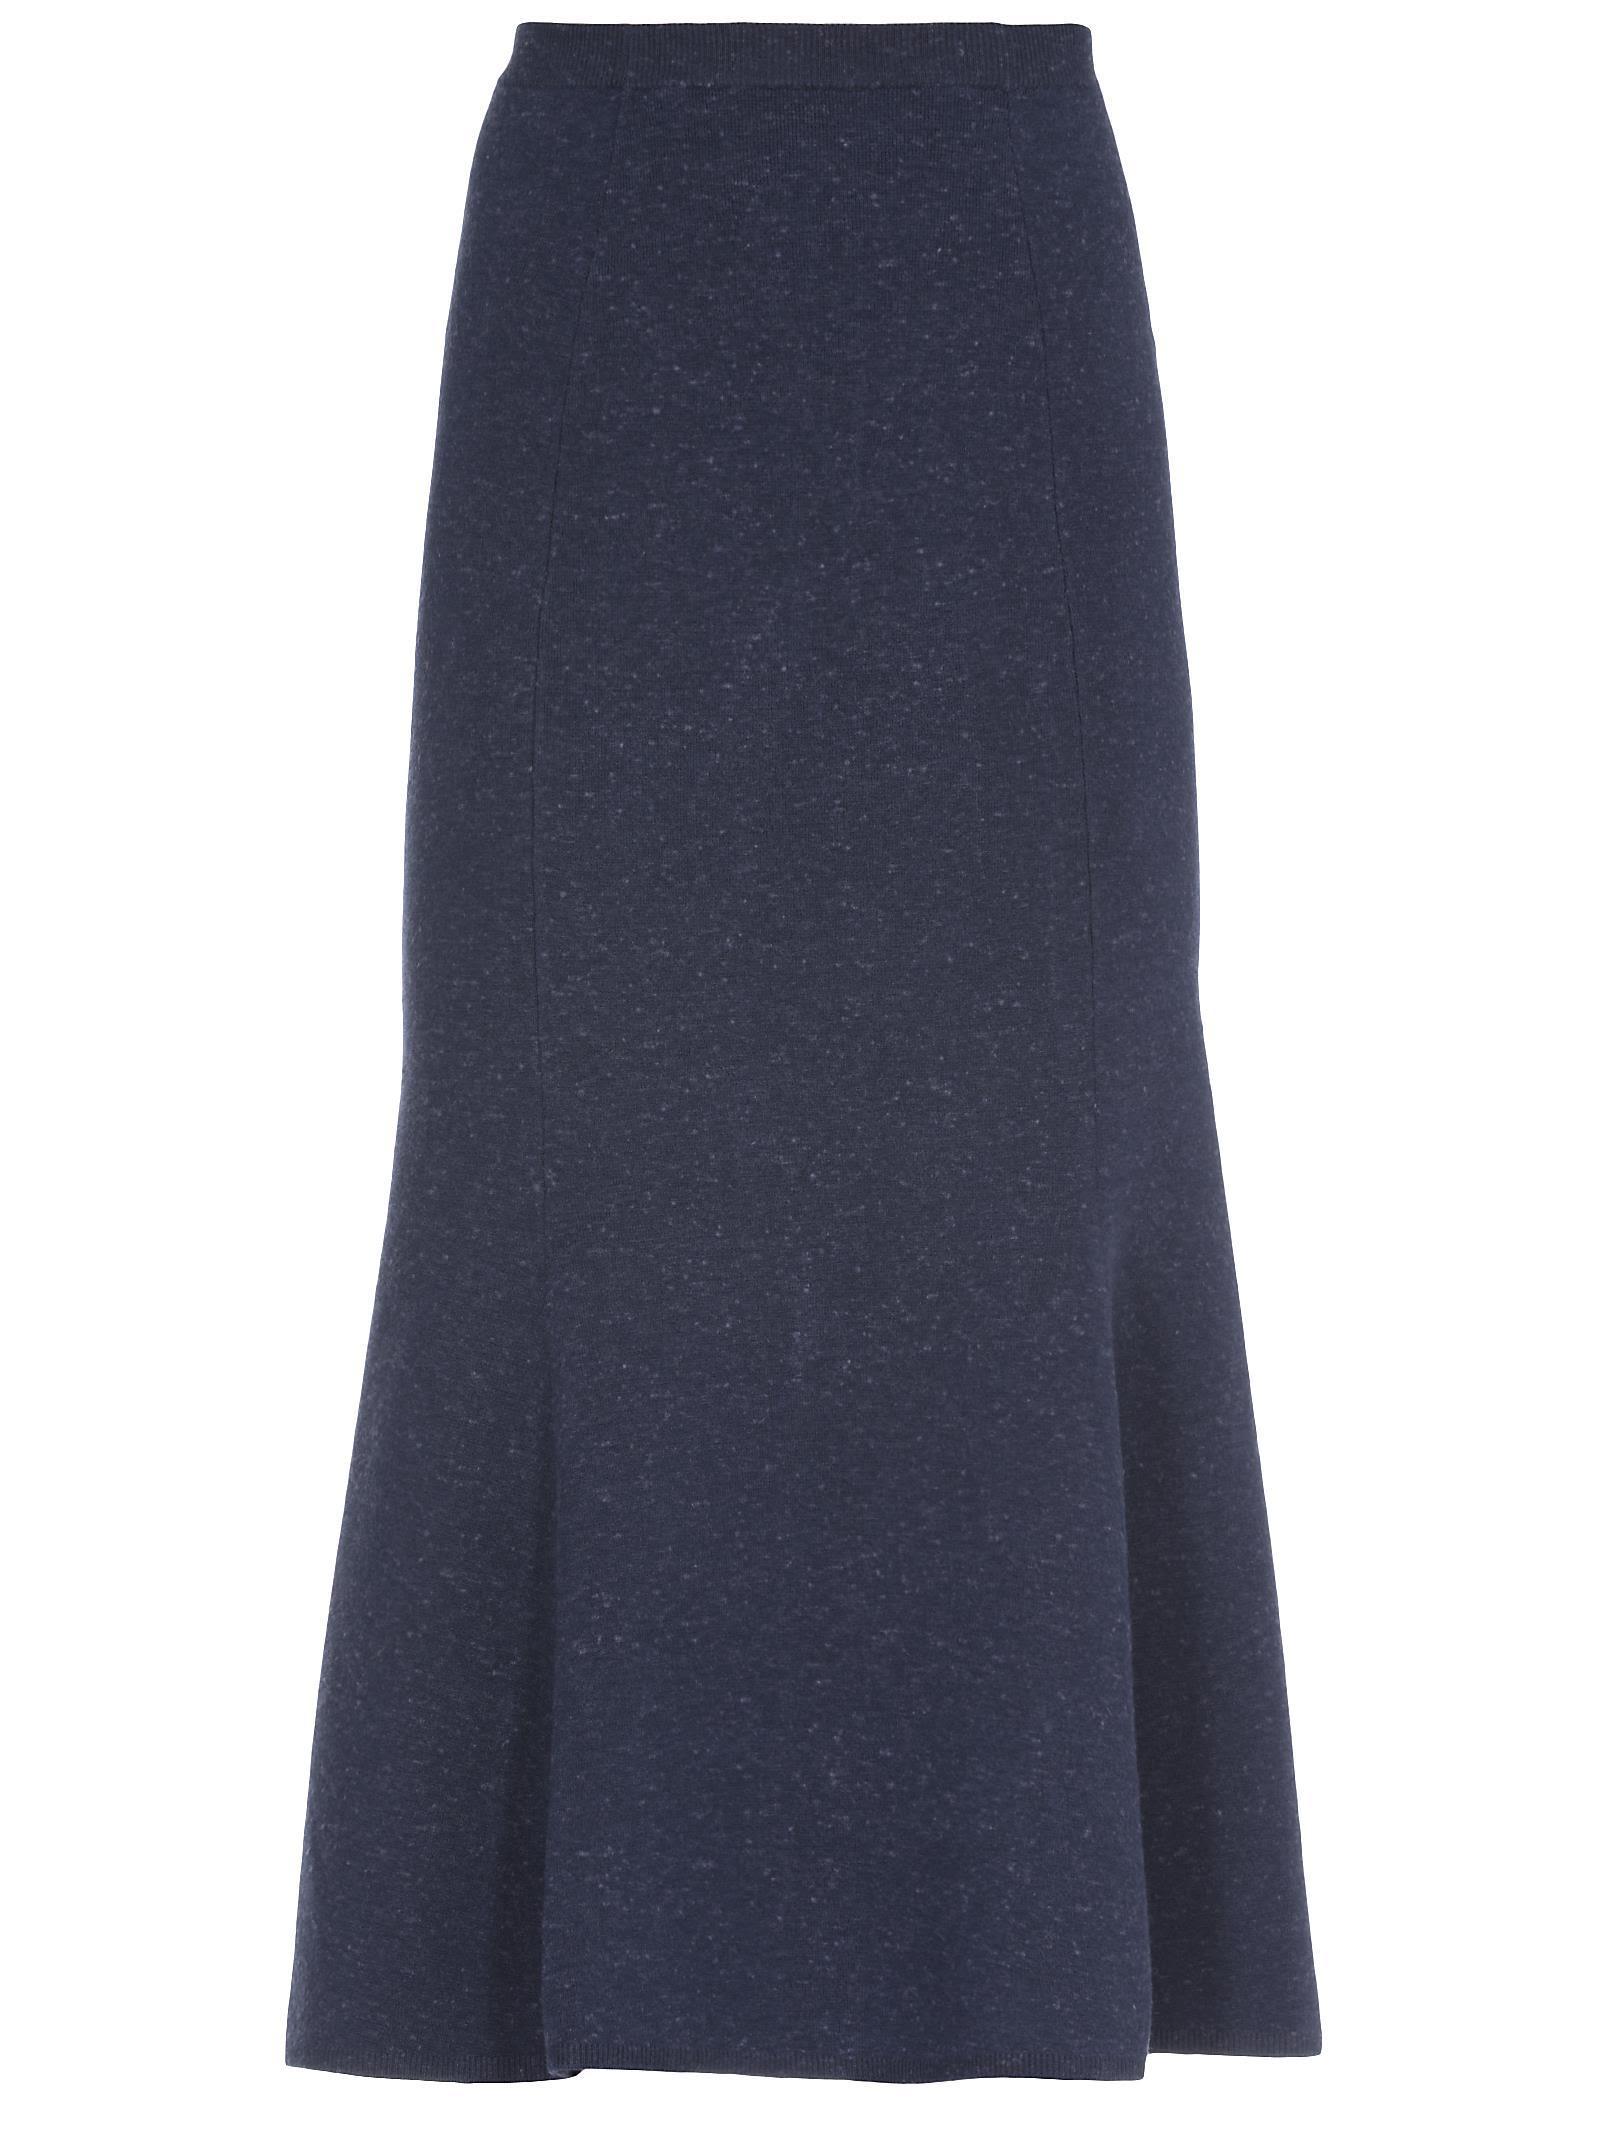 Victoria Beckham Slub Signature Skirt In Navy Melange